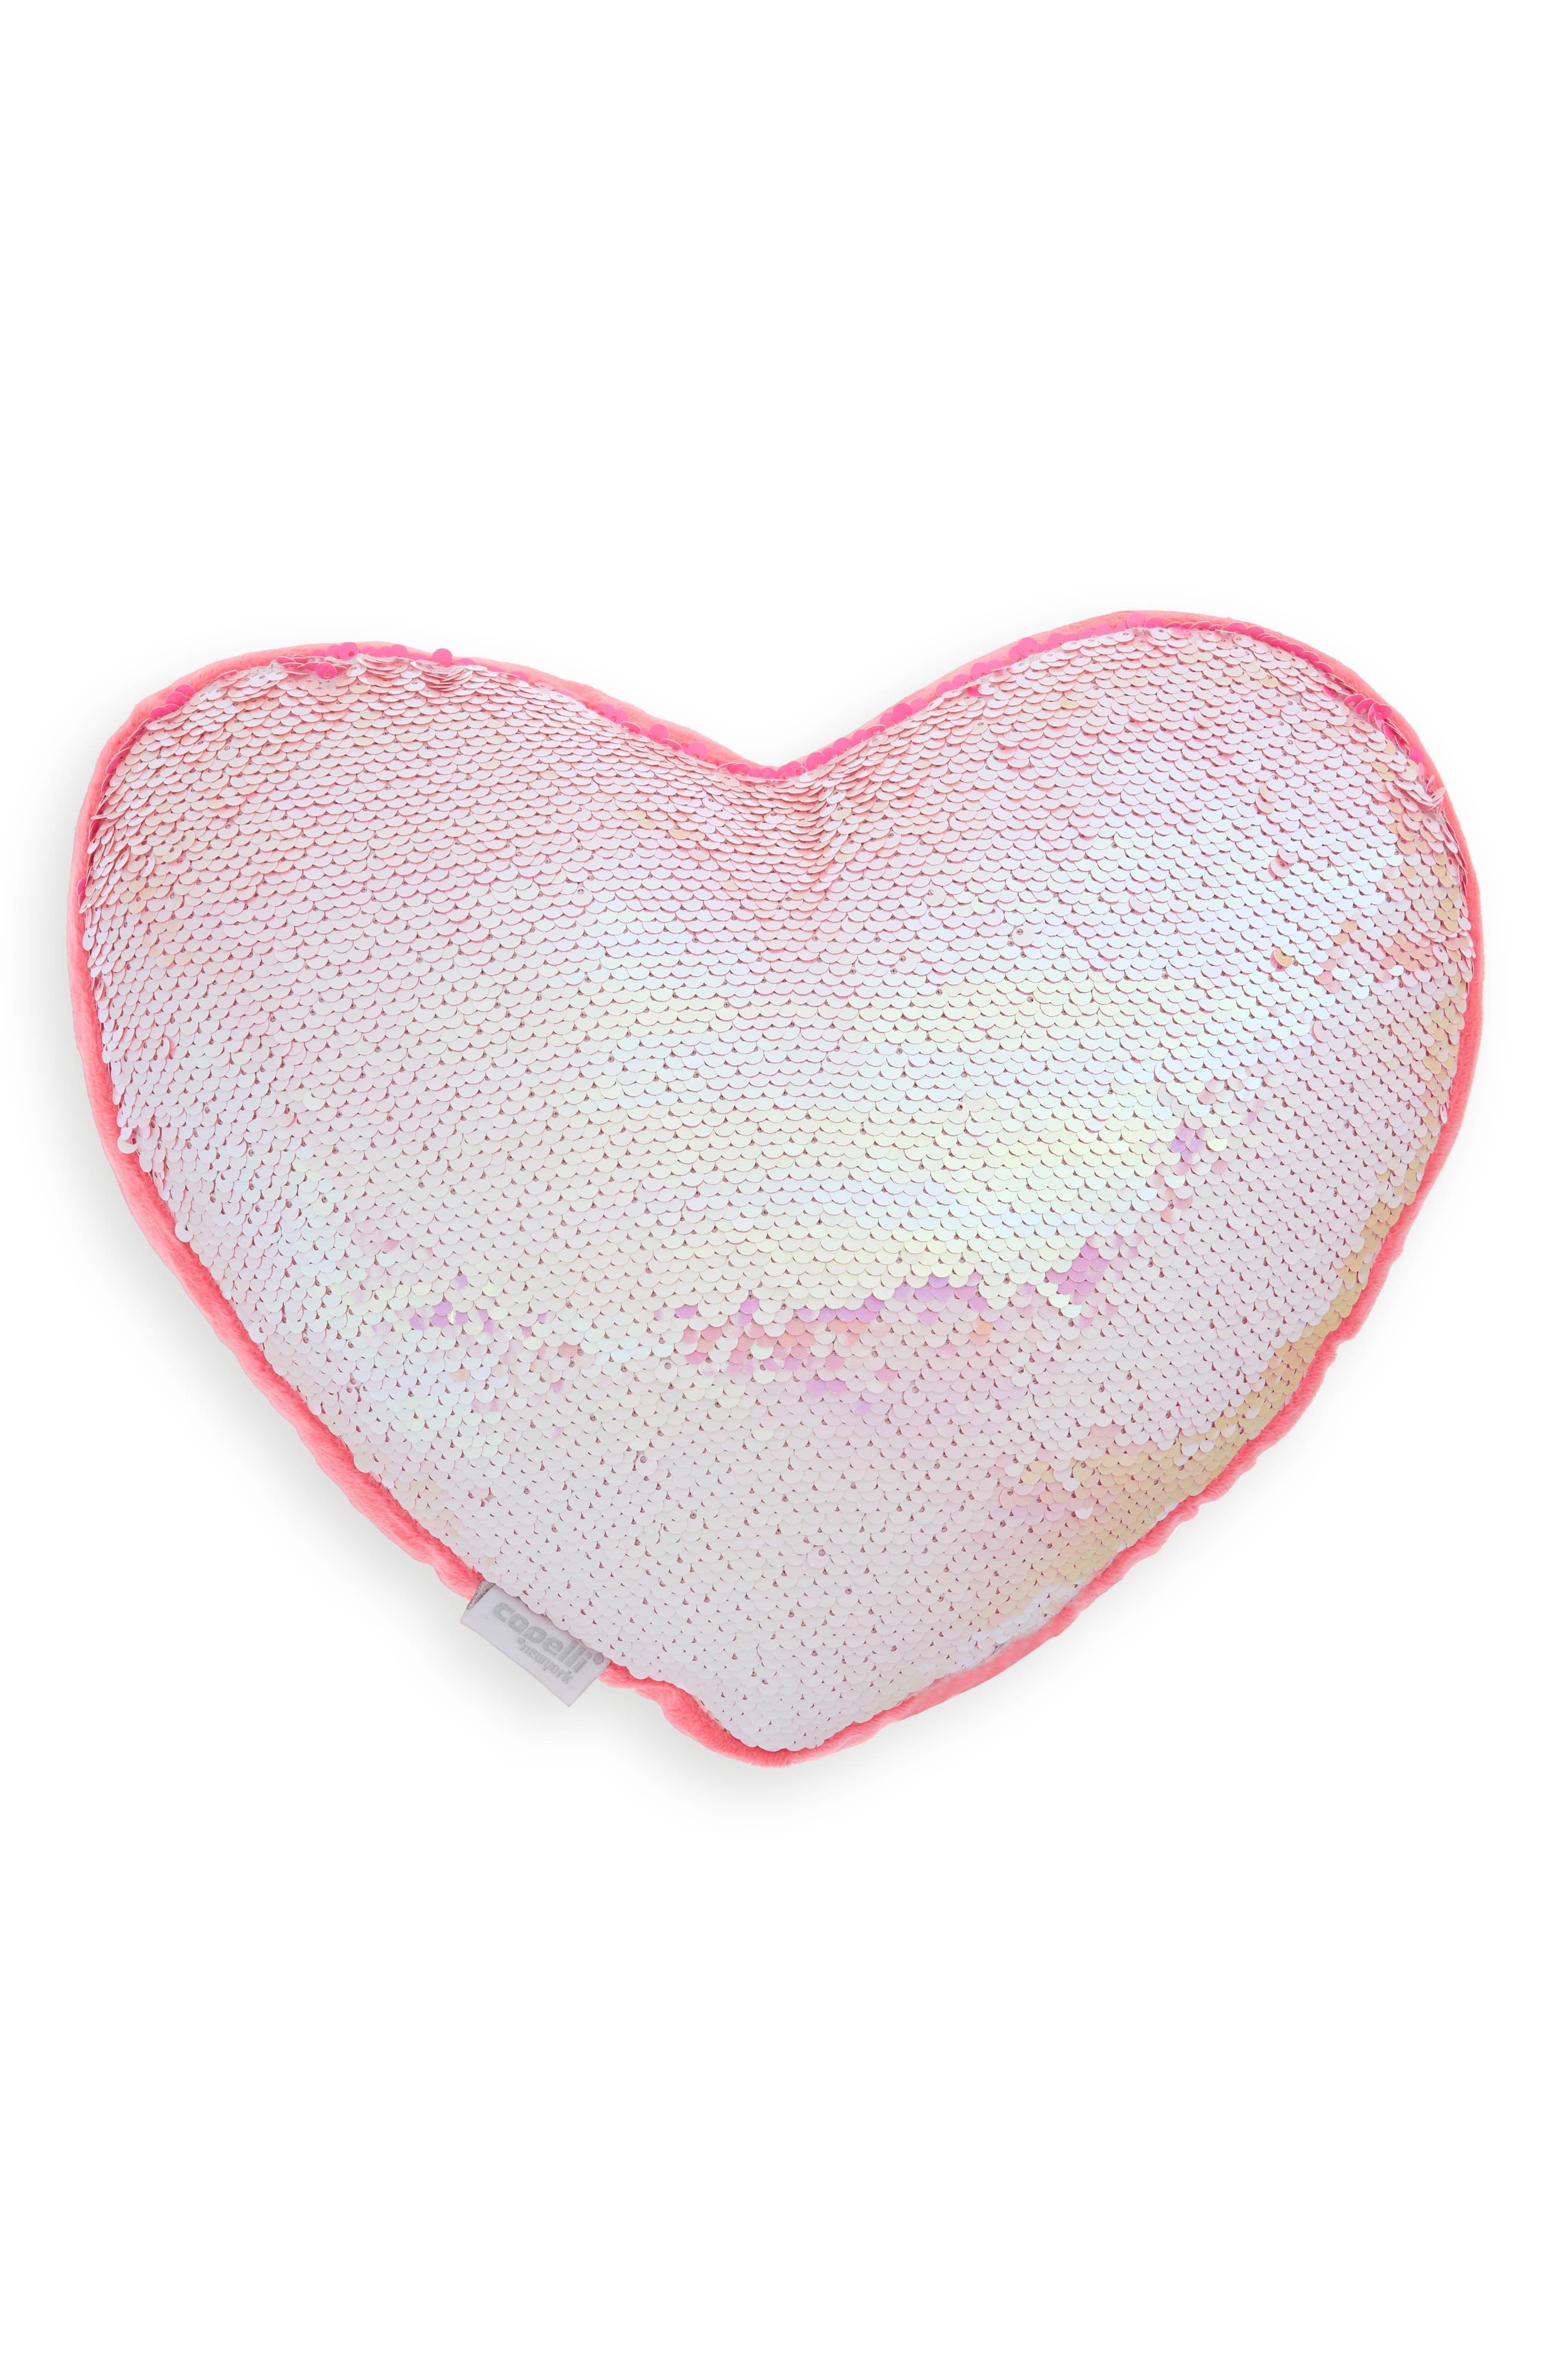 CAPELLI NEW YORK,                             Reversible Sequin Heart Pillow,                             Alternate thumbnail 4, color,                             PINK COMBO